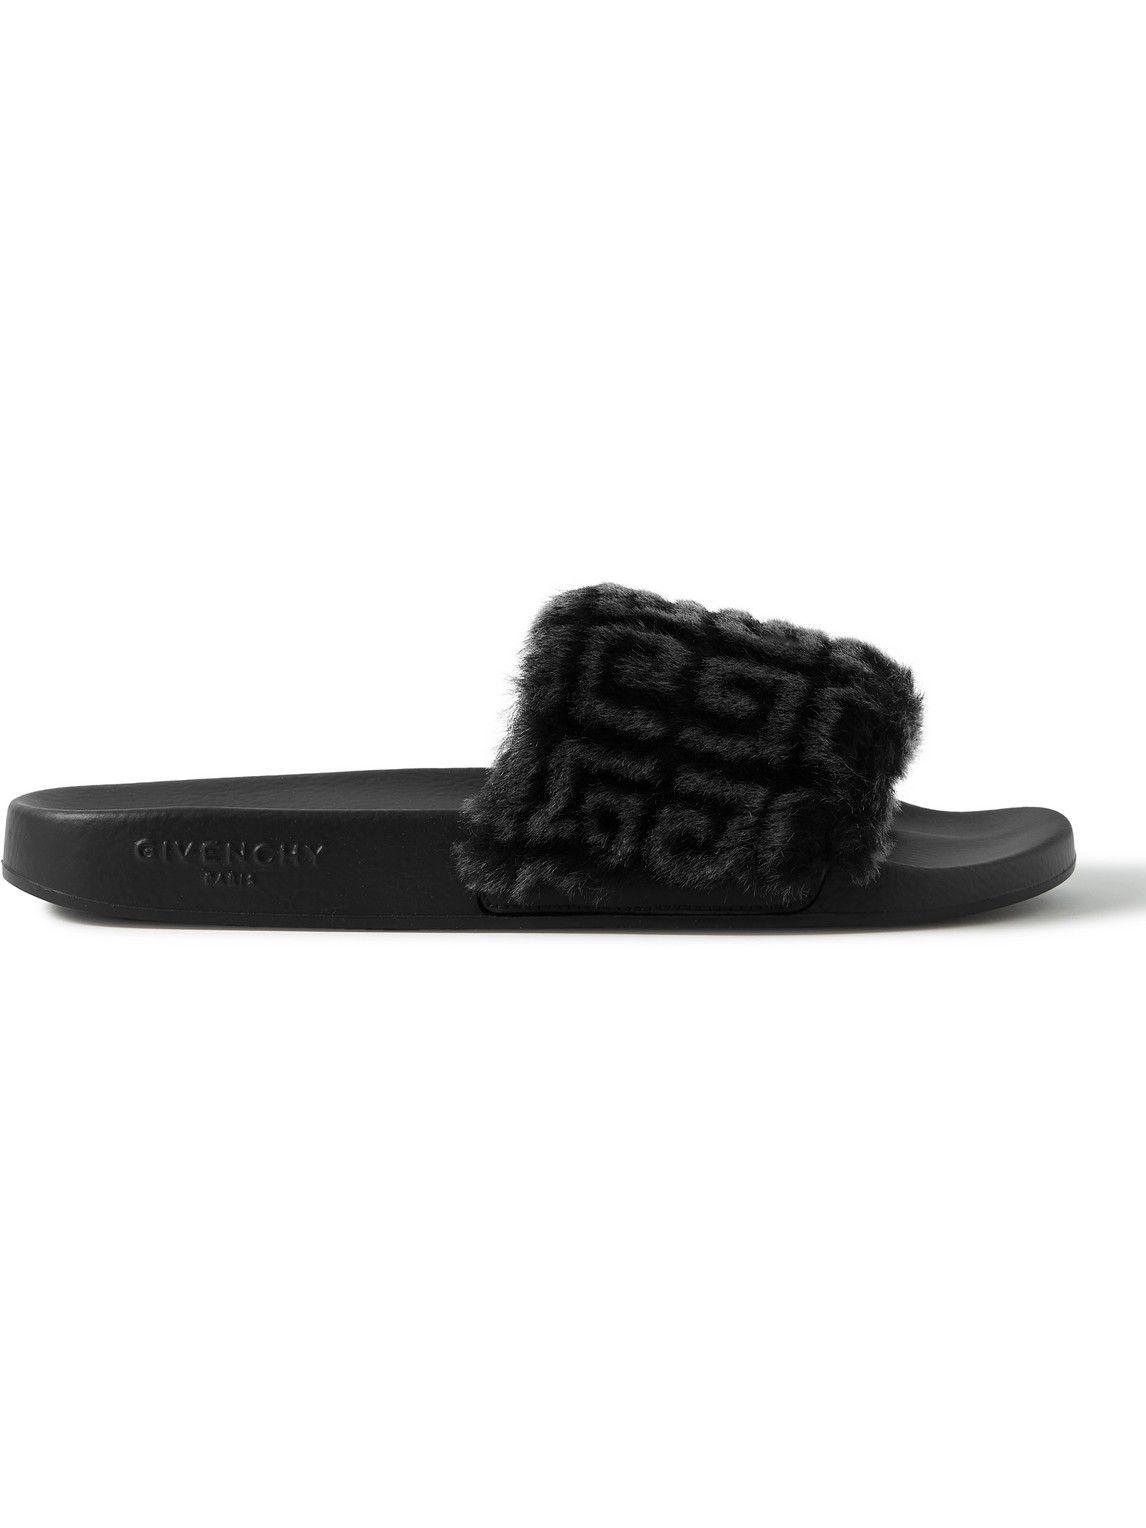 Photo: Givenchy - Printed Shearling and Rubber Slides - Black